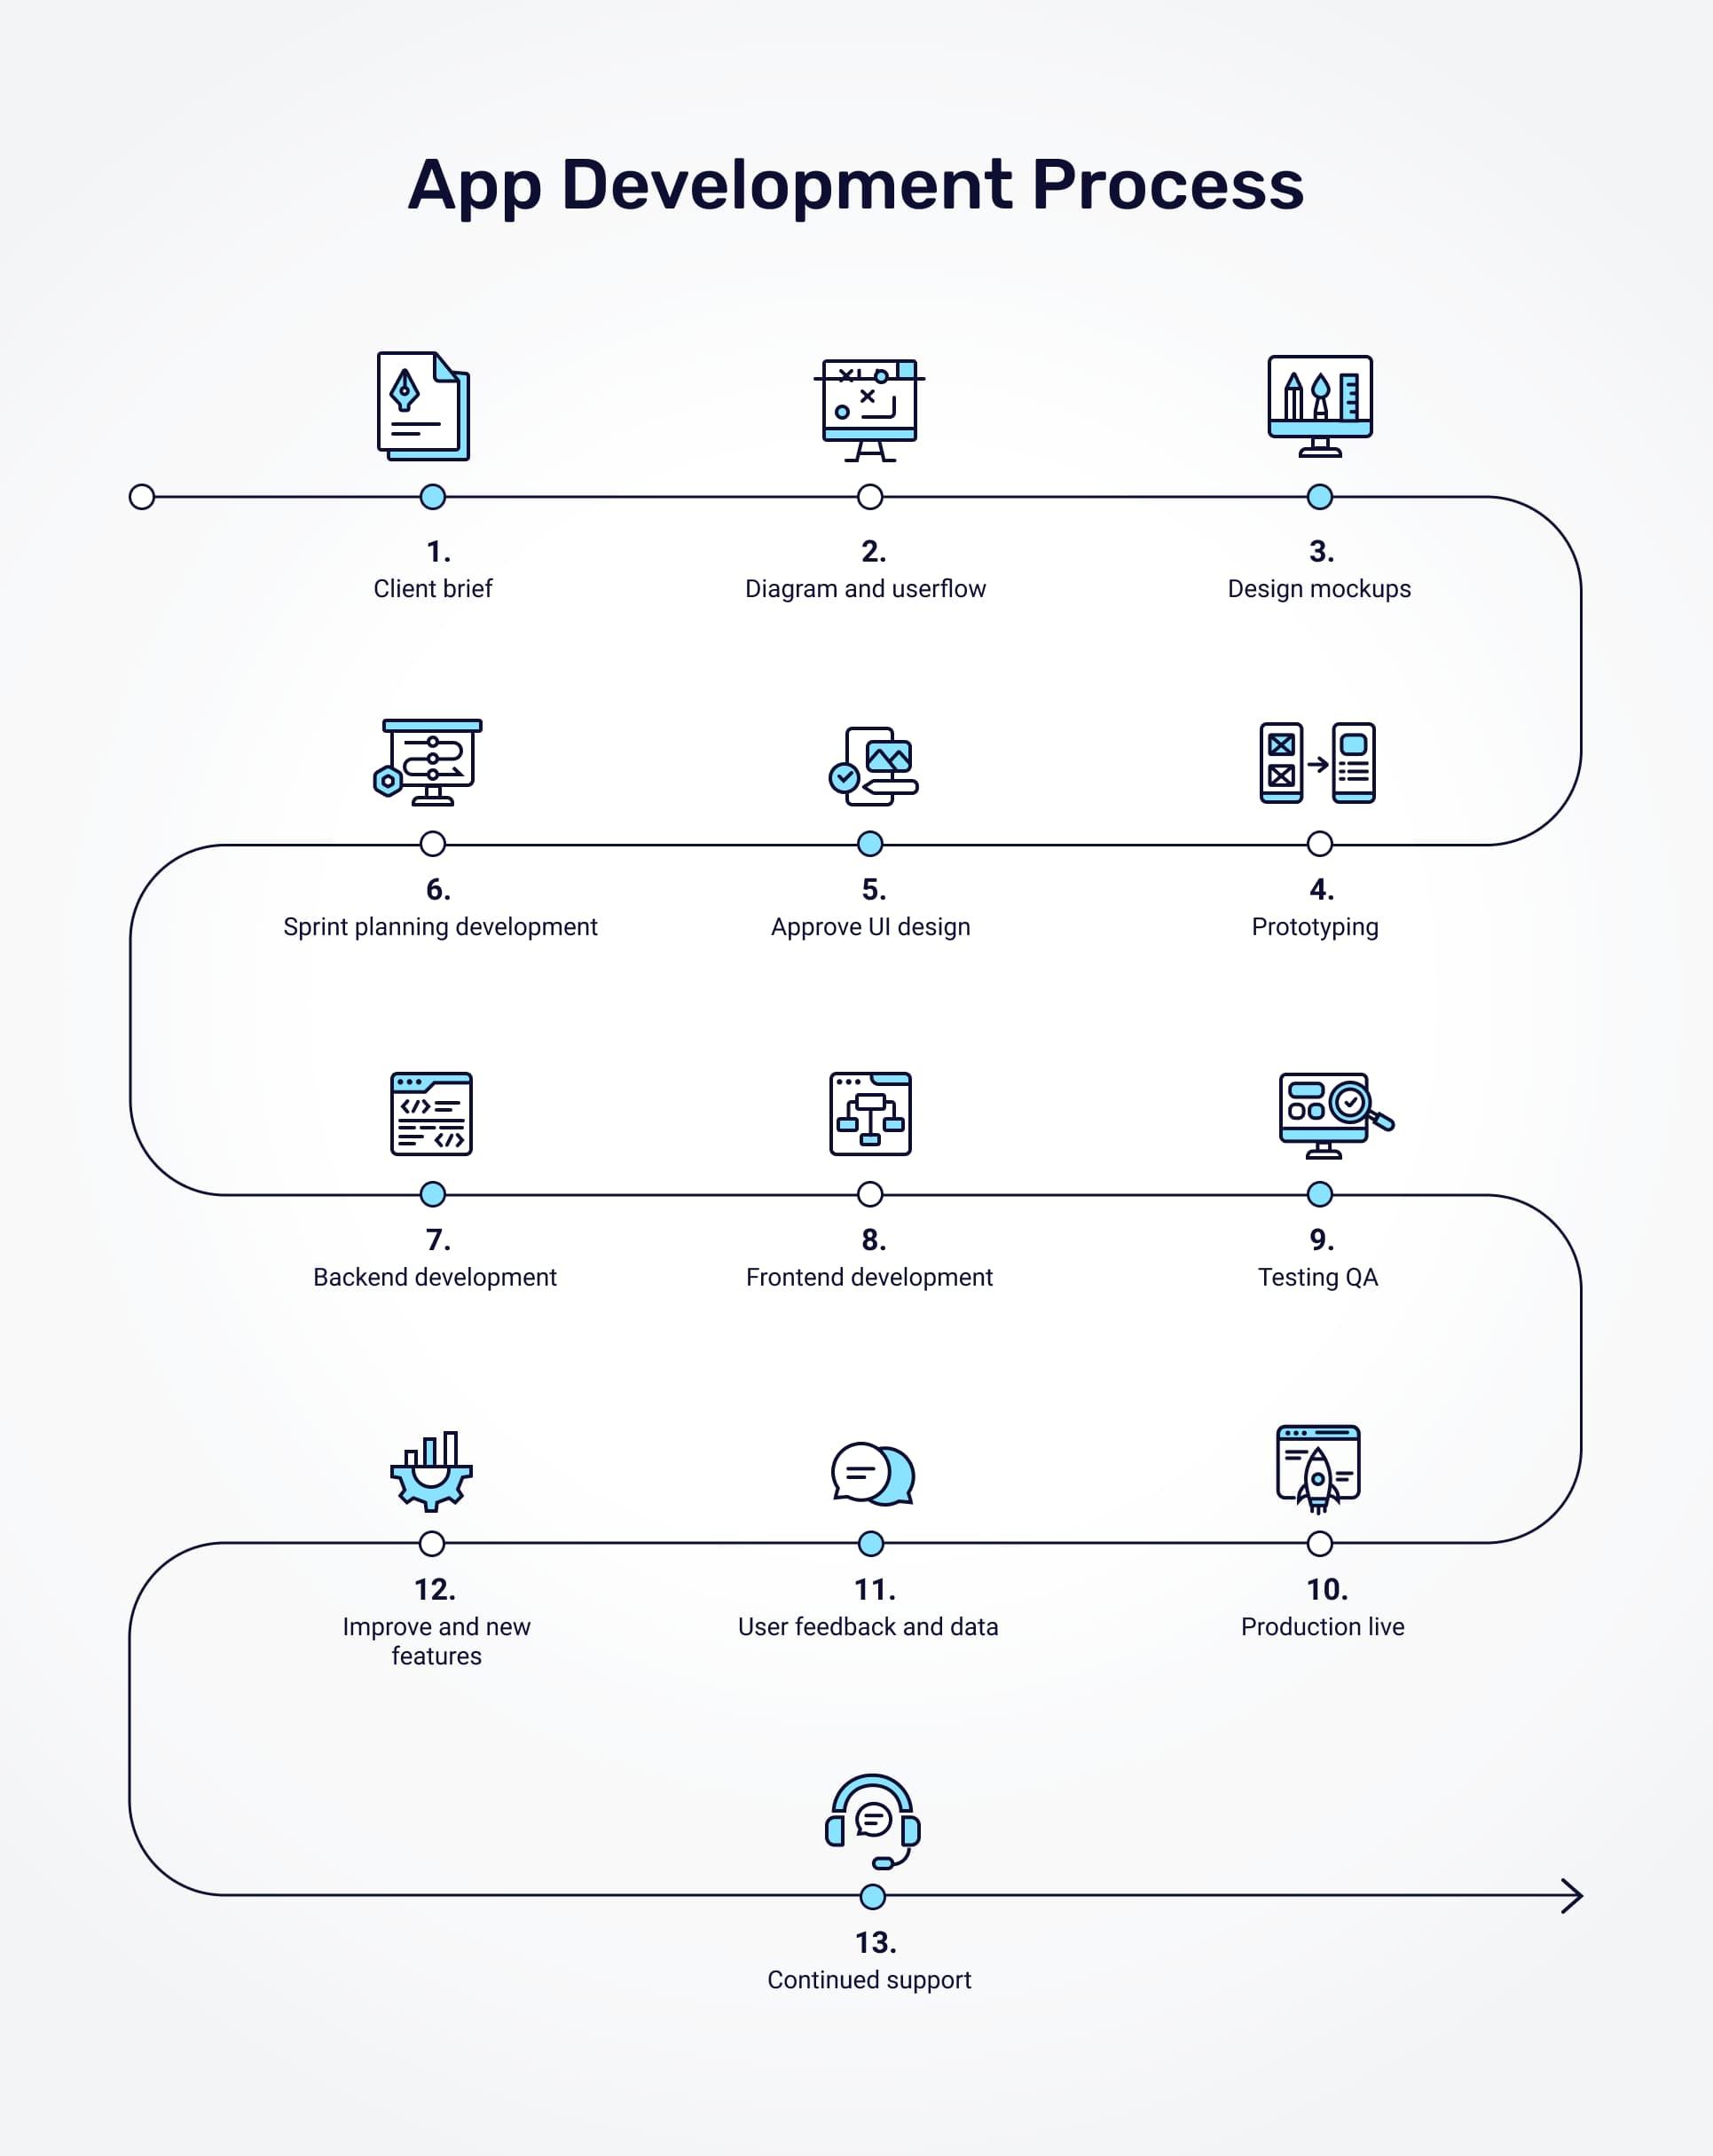 appello software's app development process flowchart